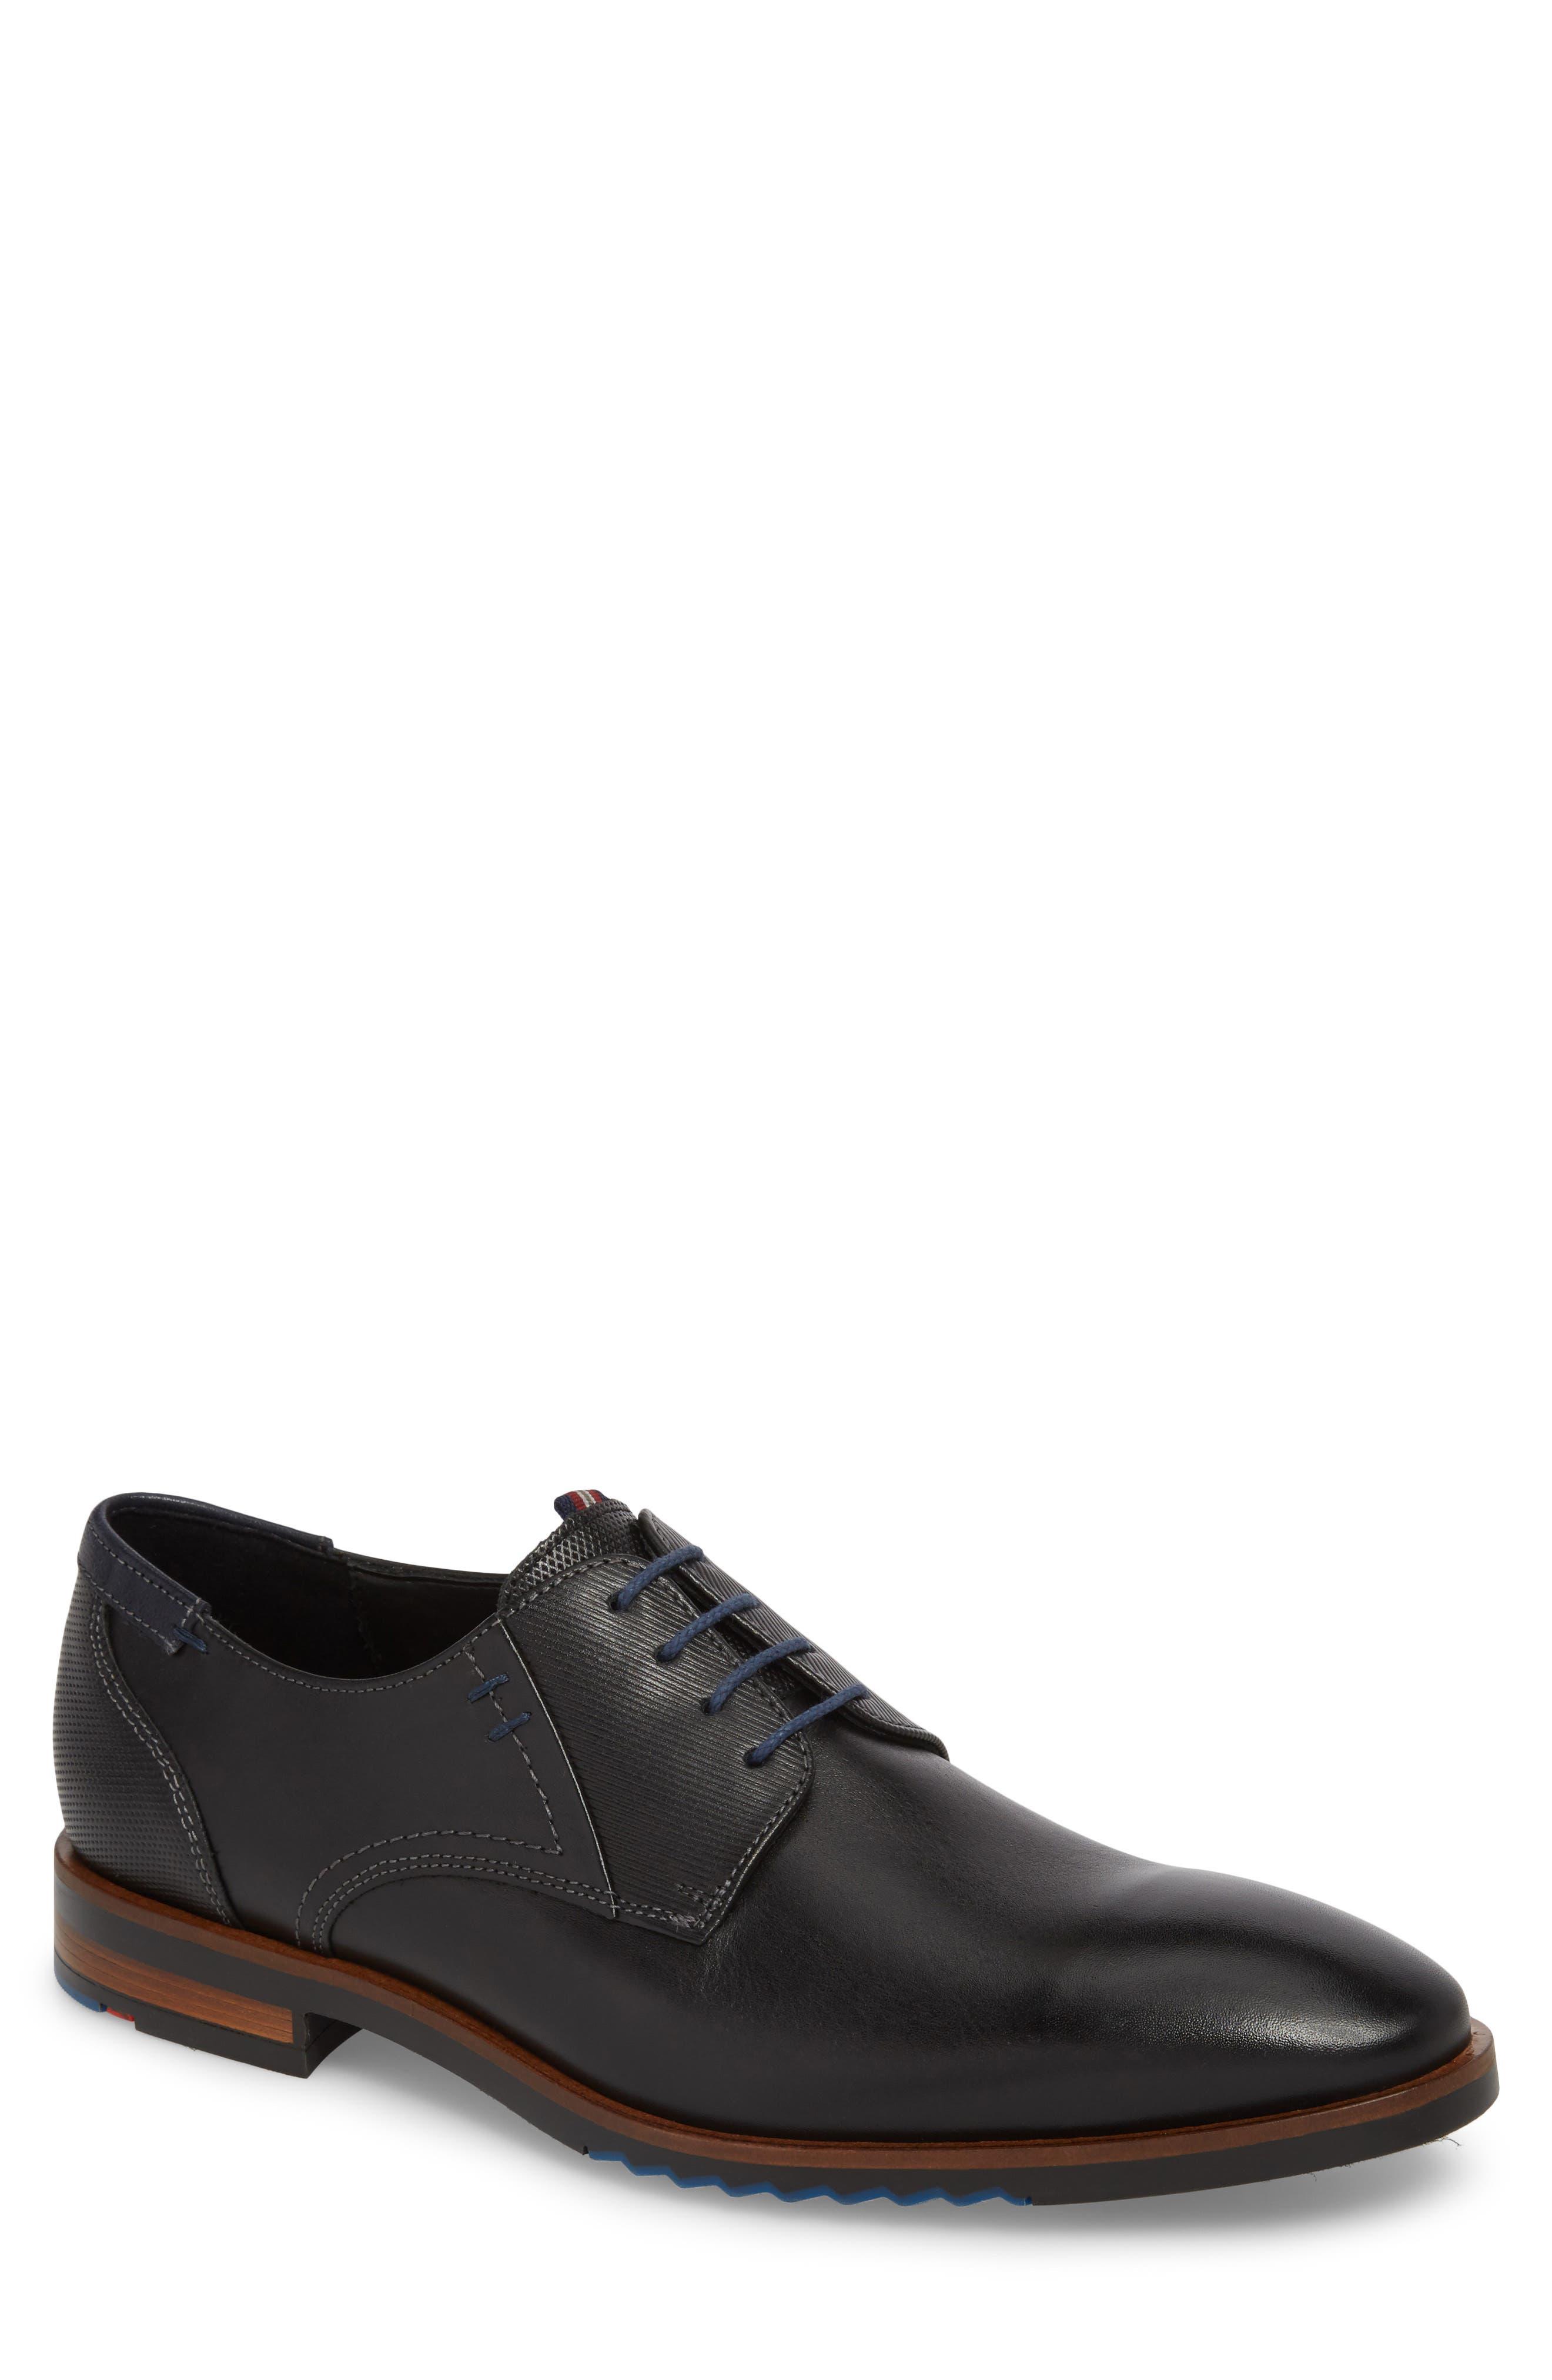 Deno Plain Toe Derby,                             Main thumbnail 1, color,                             Black/ Blue Leather